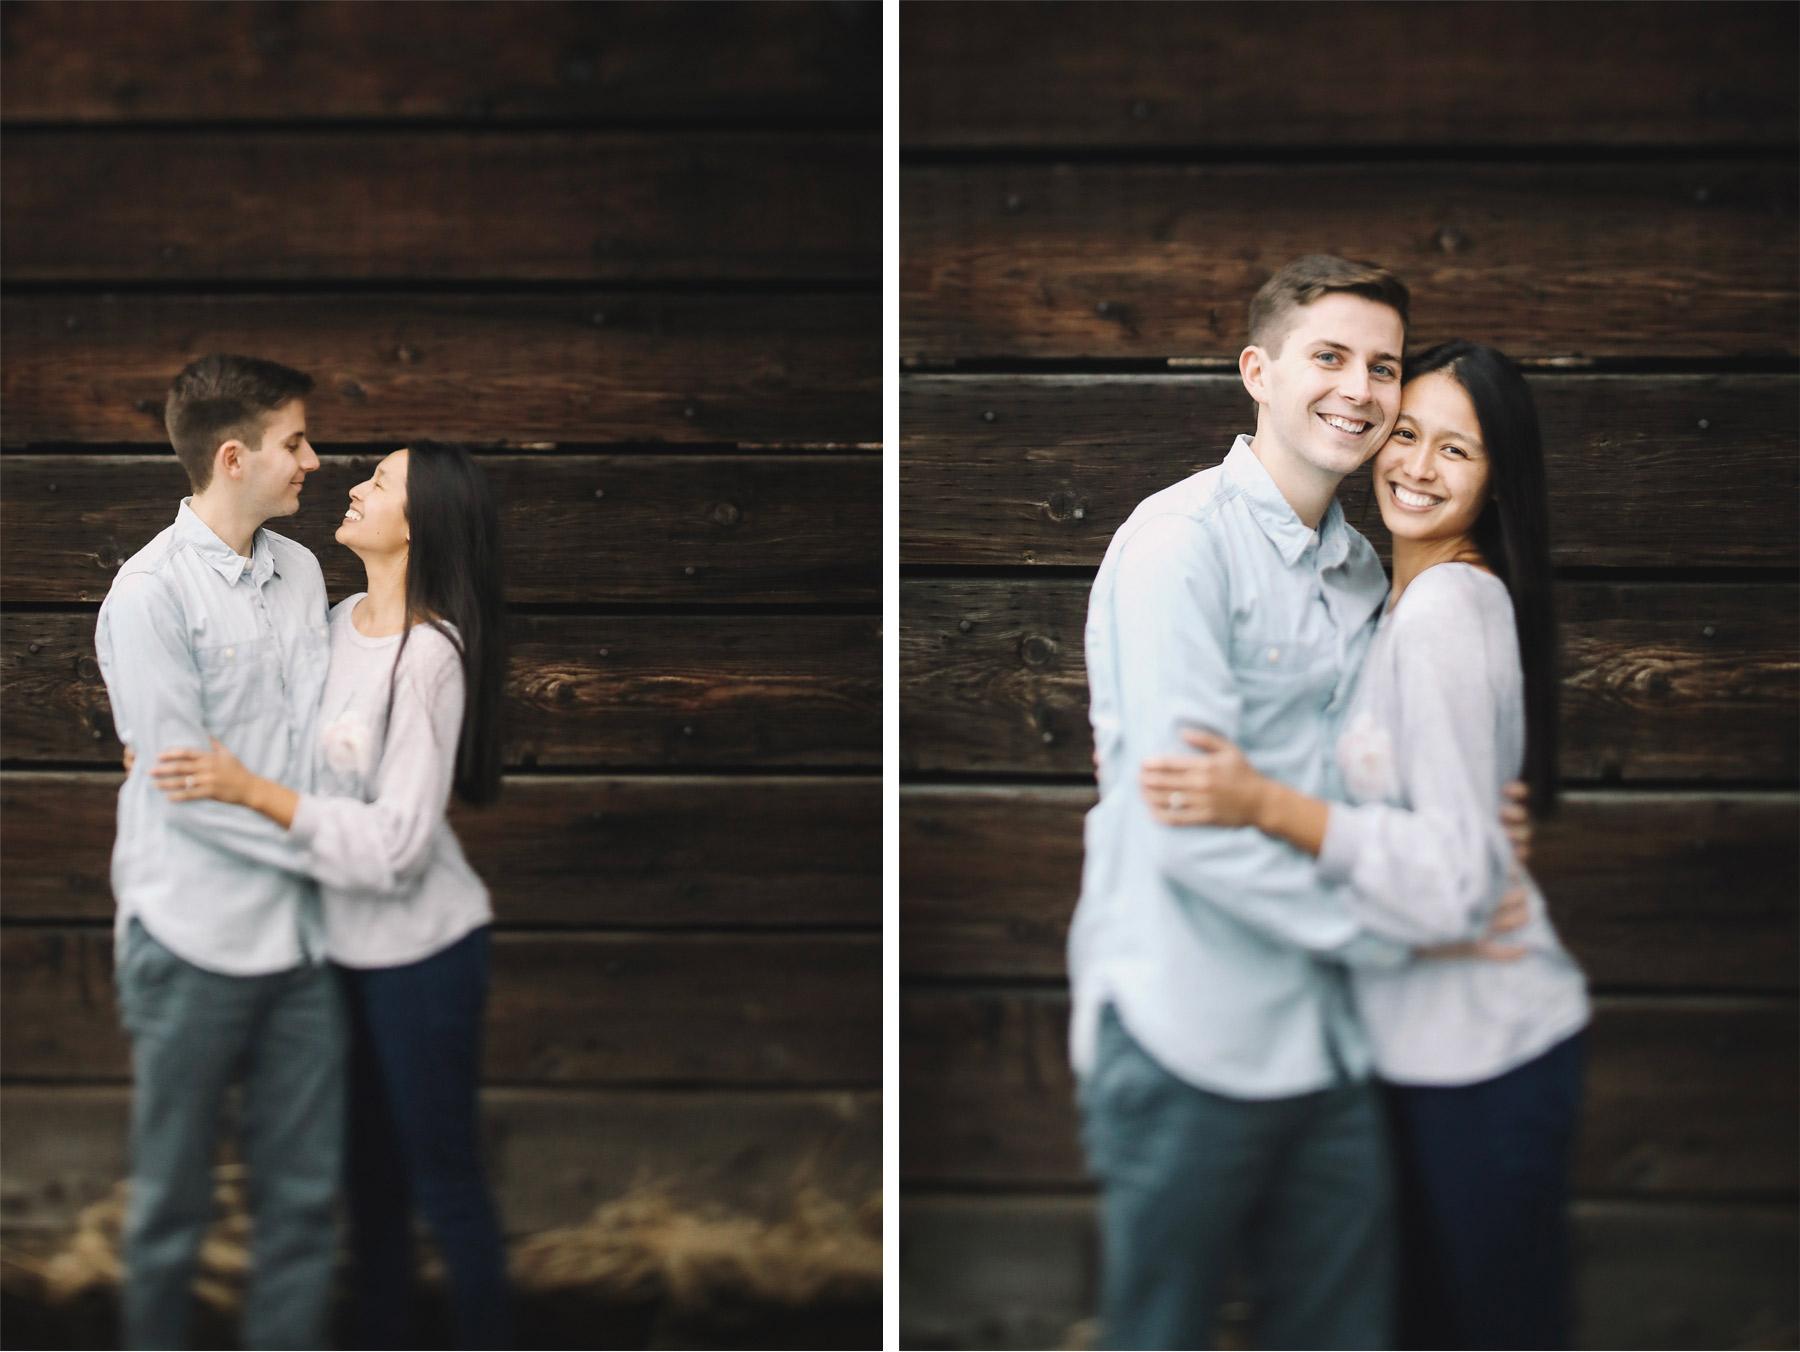 01-Engagement-Session-Vick-Photography-Edina-Minneapolis-Minnesota-Barnwood-Ashley-and-Nicholas.jpg